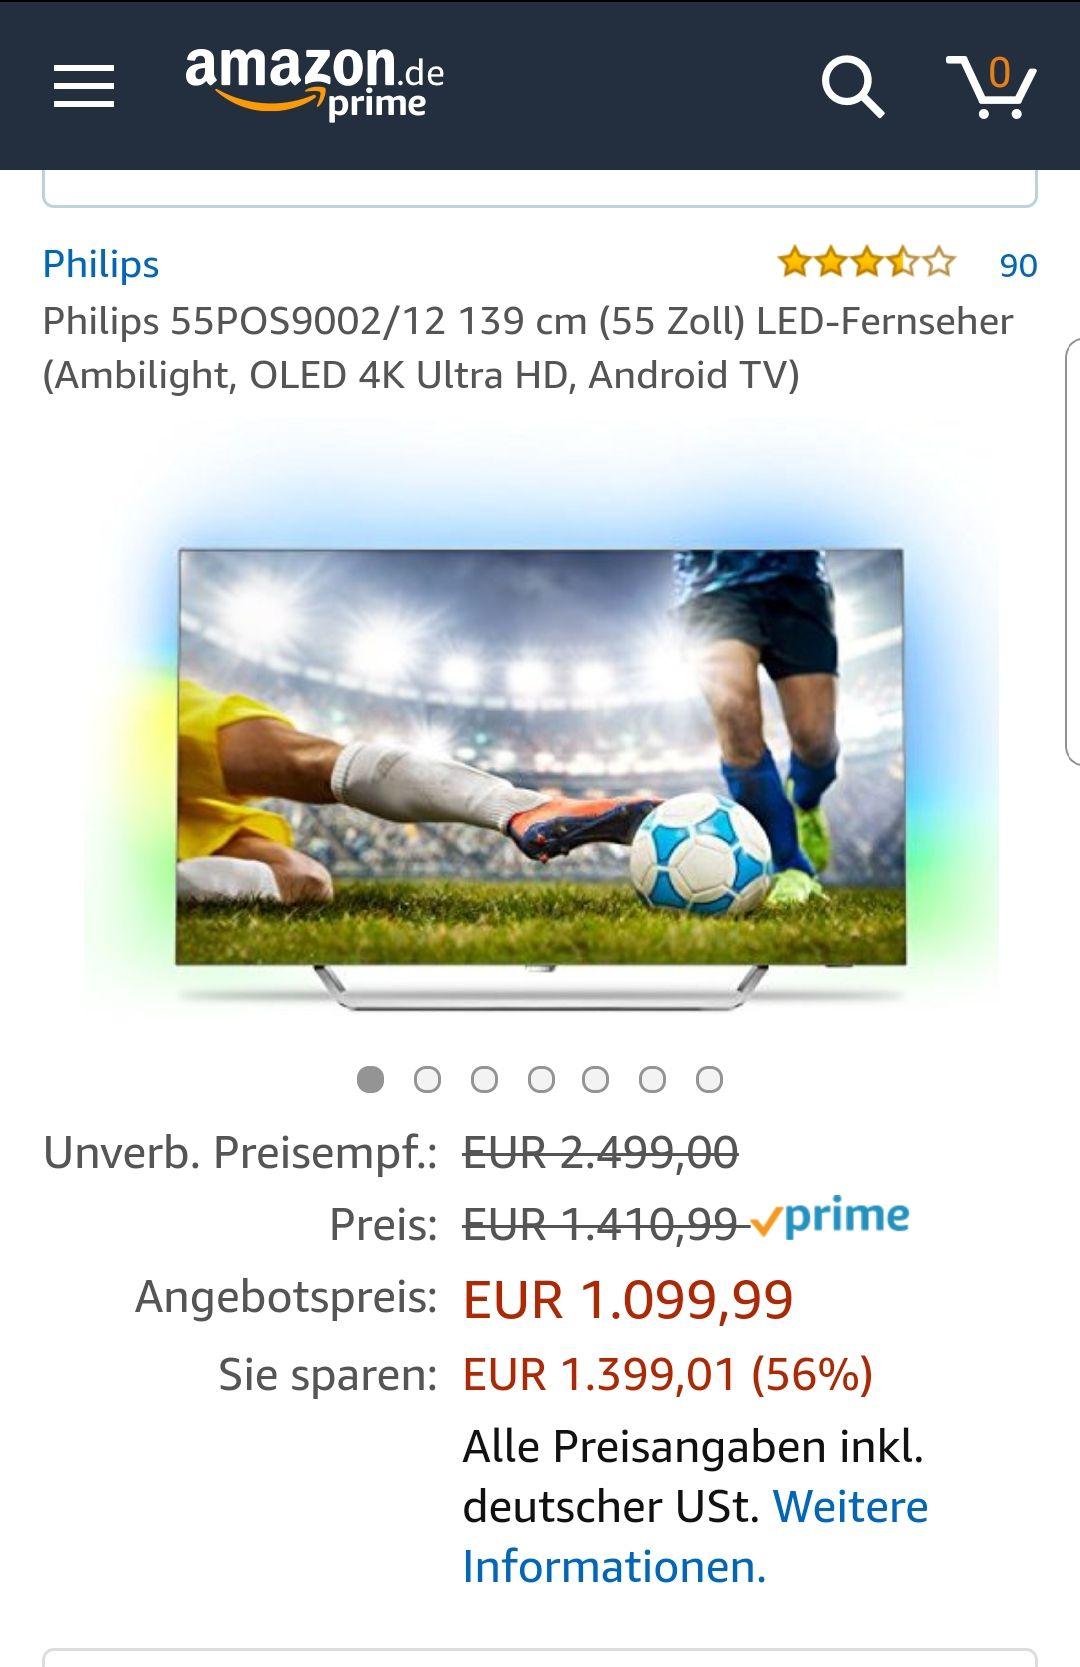 Amazon Prime Day Philips 55POS9002/12